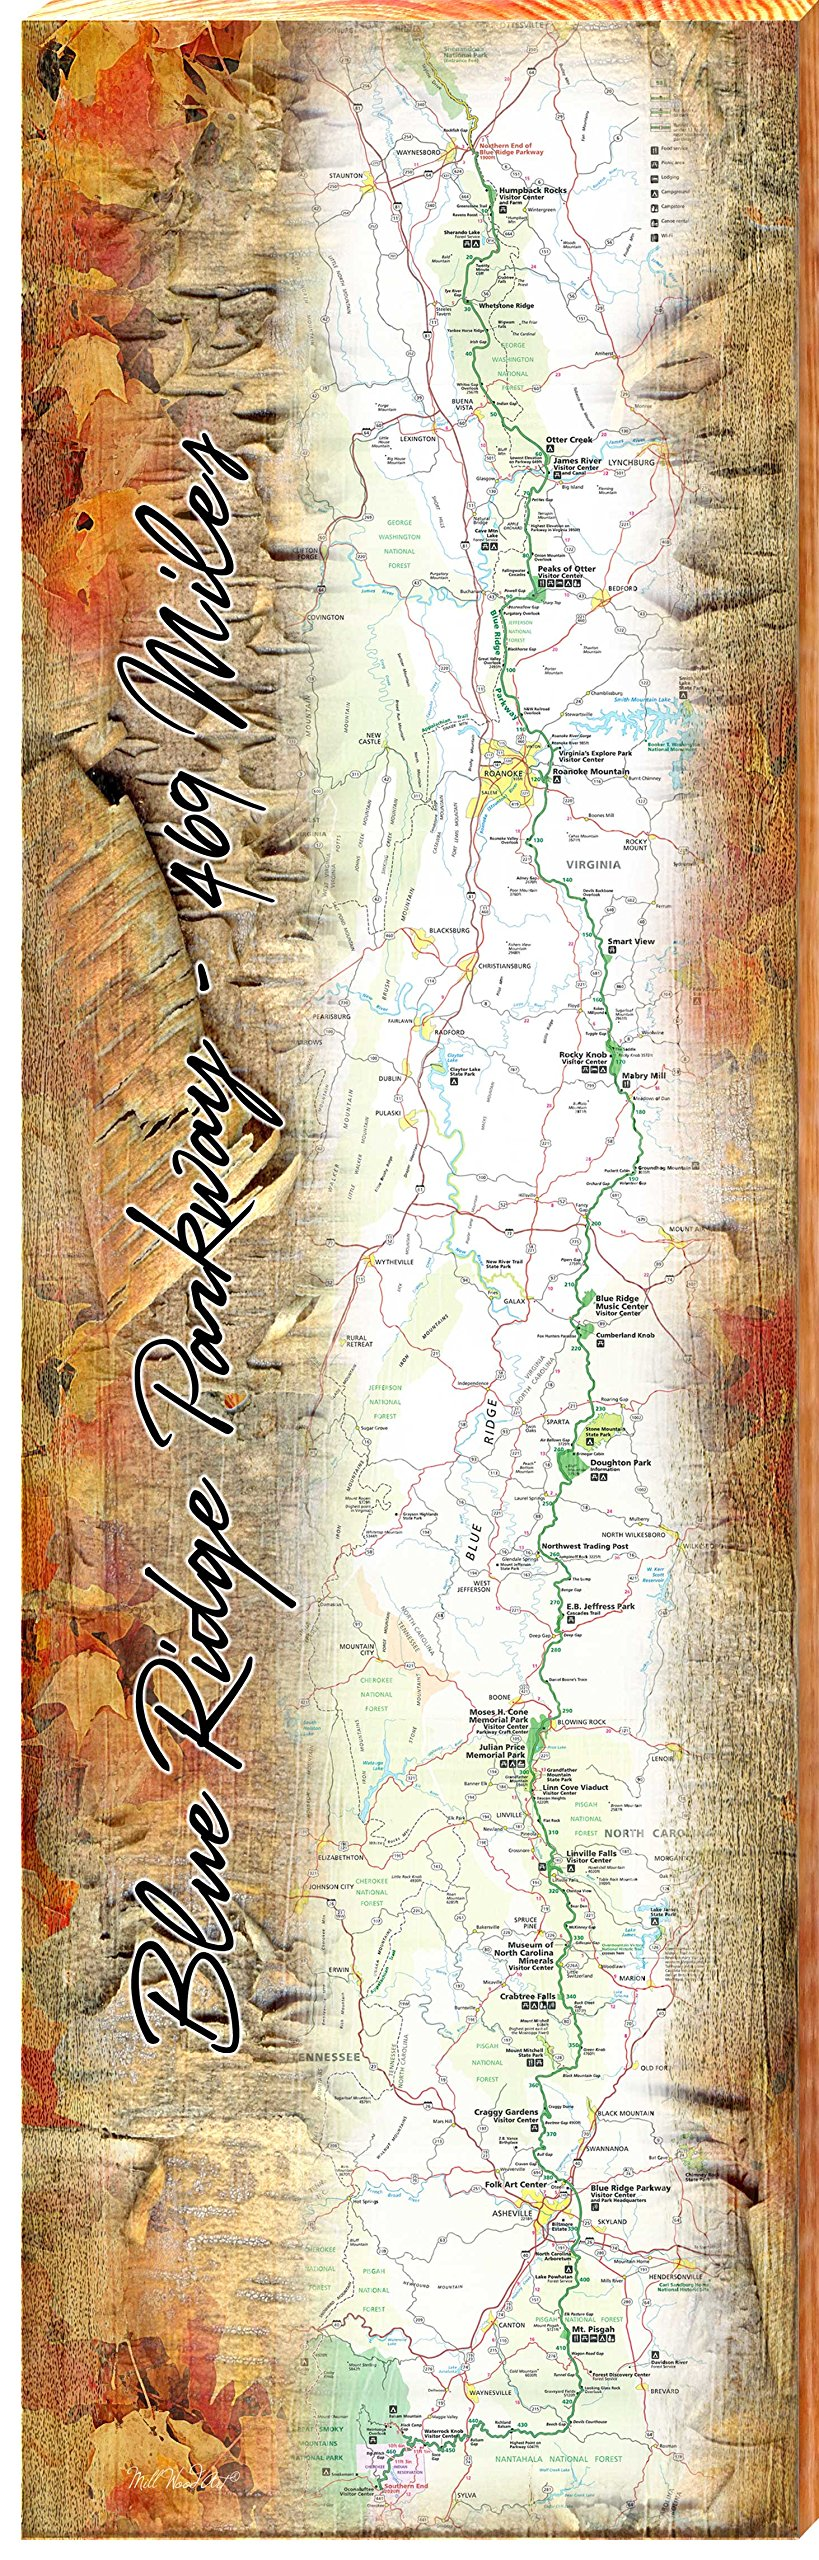 MILL WOOD ART Blue Ridge Parkway Map Home Decor Art Print on Real Wood (9.5''x30'')